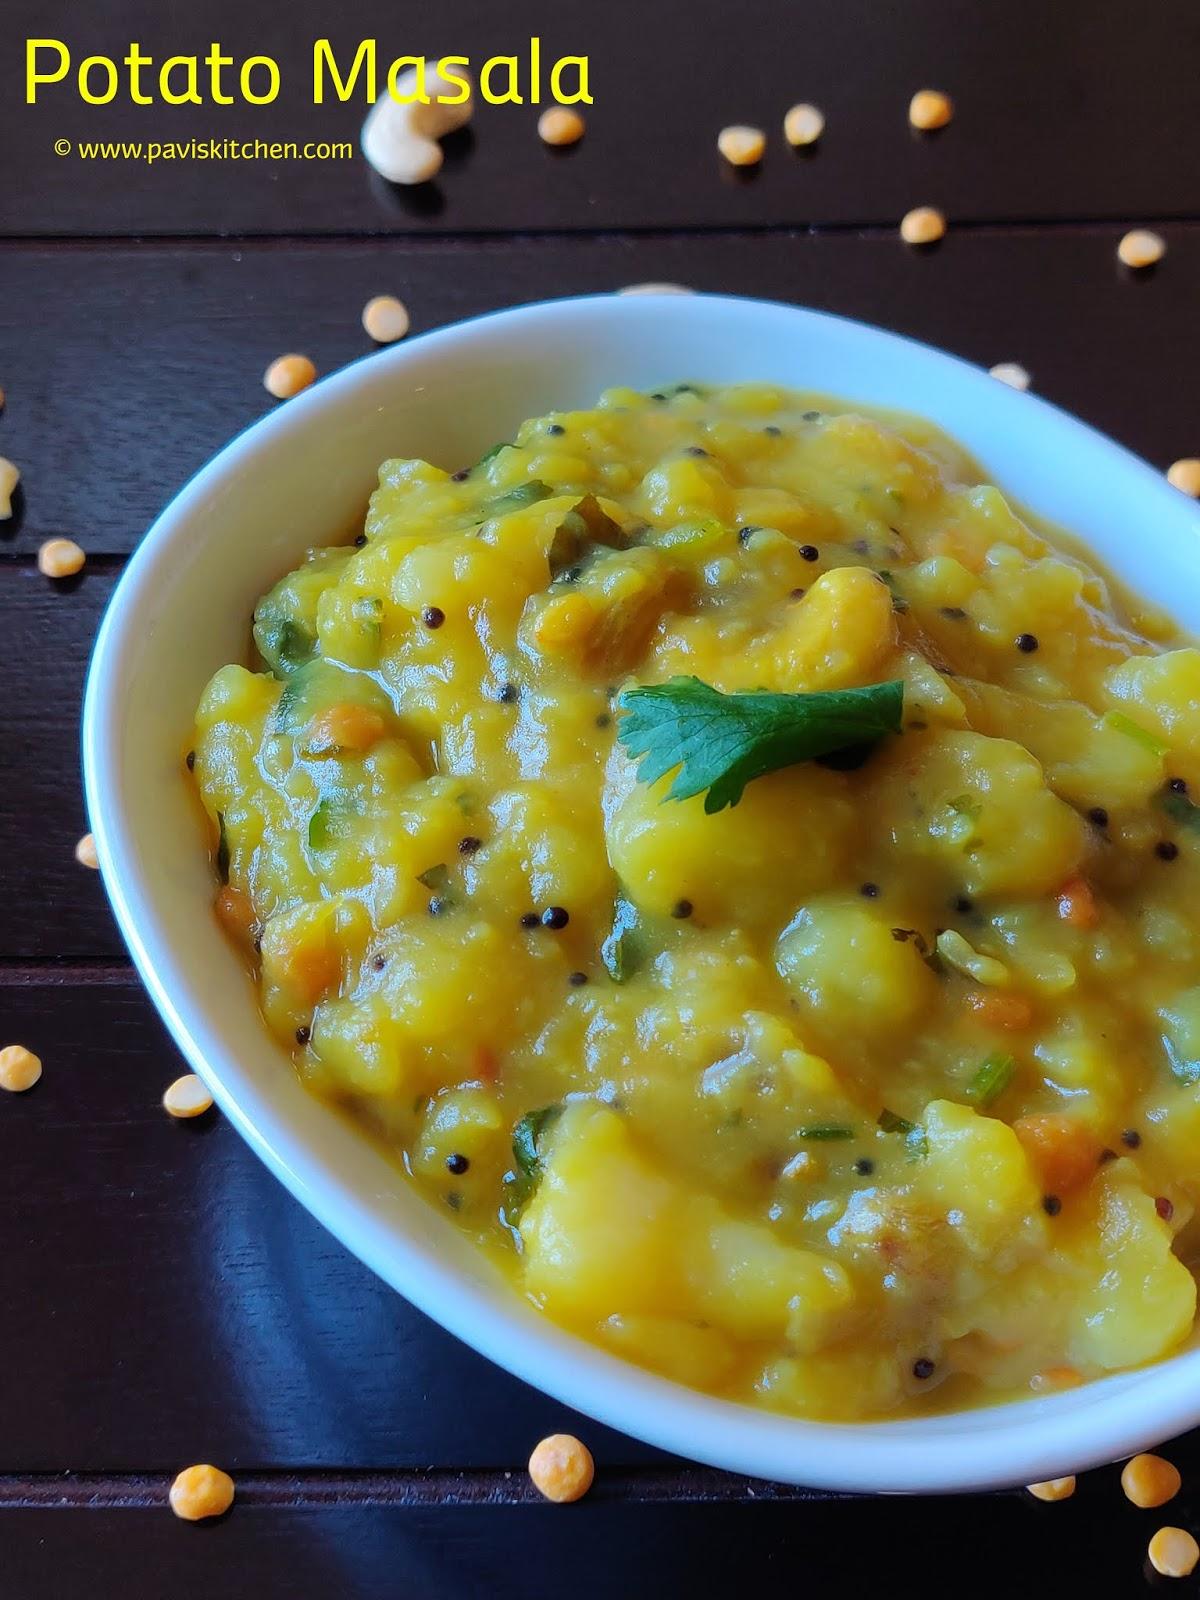 Potato Masala For Poori | Poori Masala Recipe | Poori Kizhangu